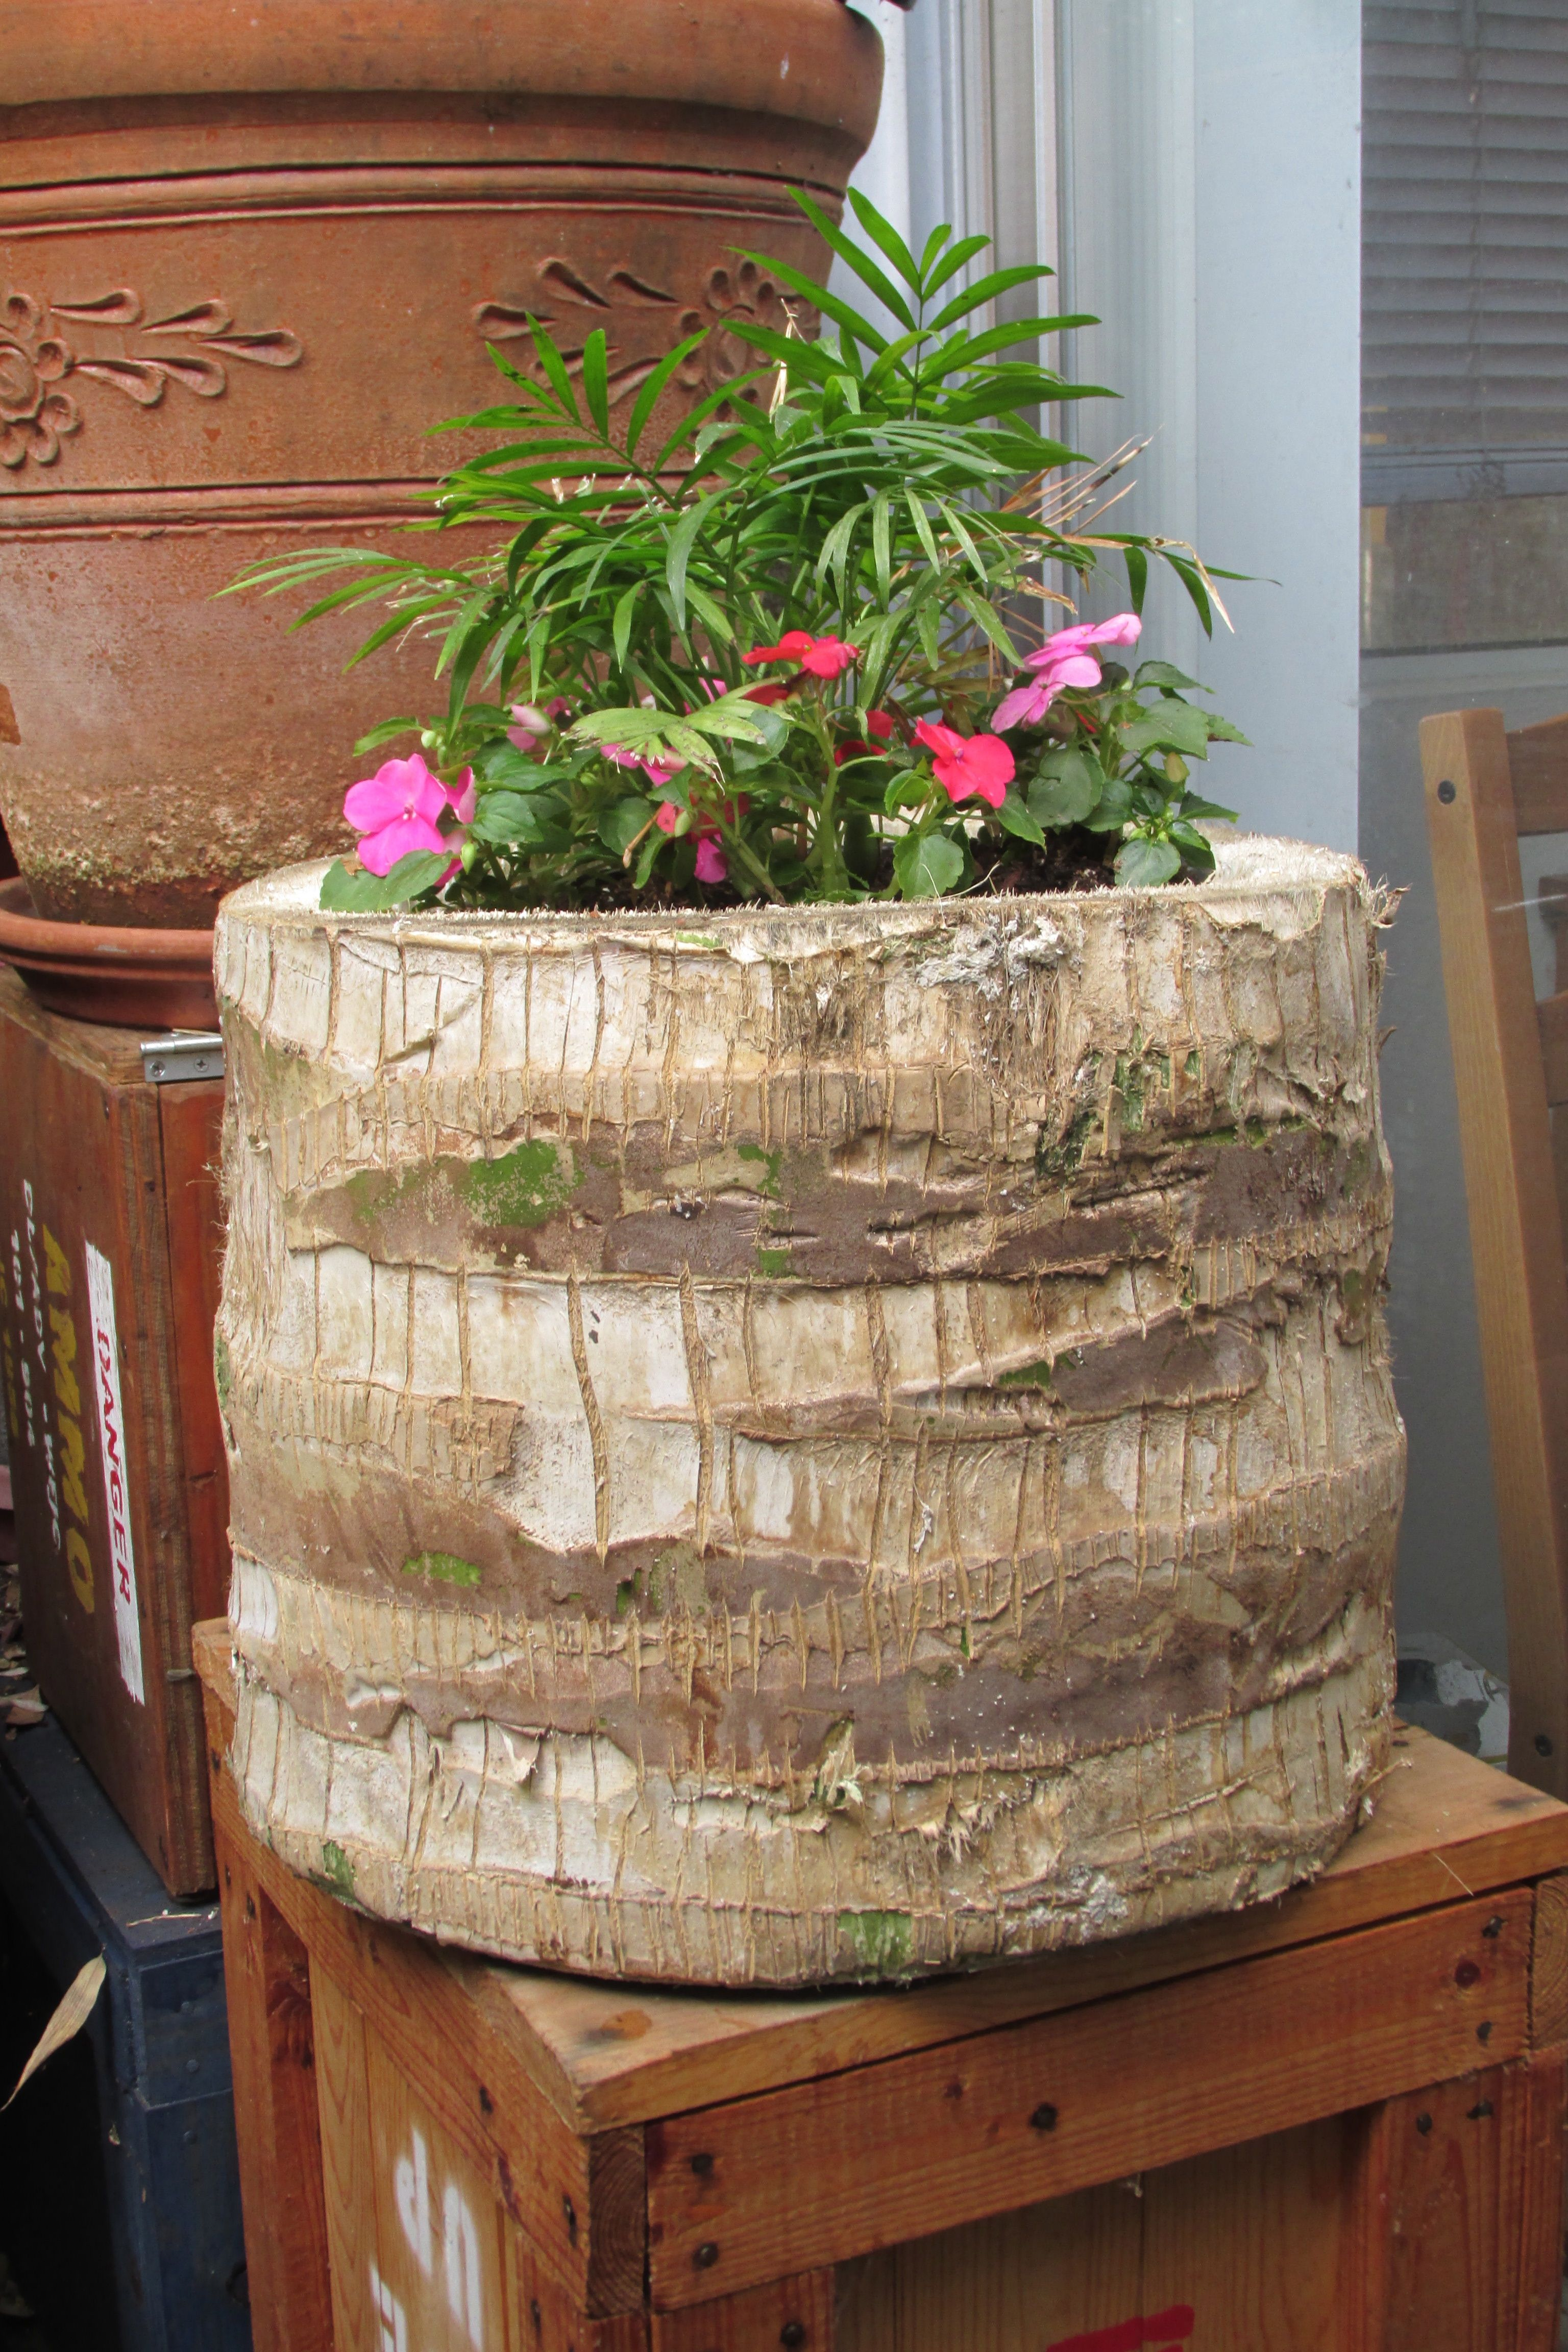 Planter i made out of a palm tree stump repurpose pinterest planter i made out of a palm tree stump reviewsmspy